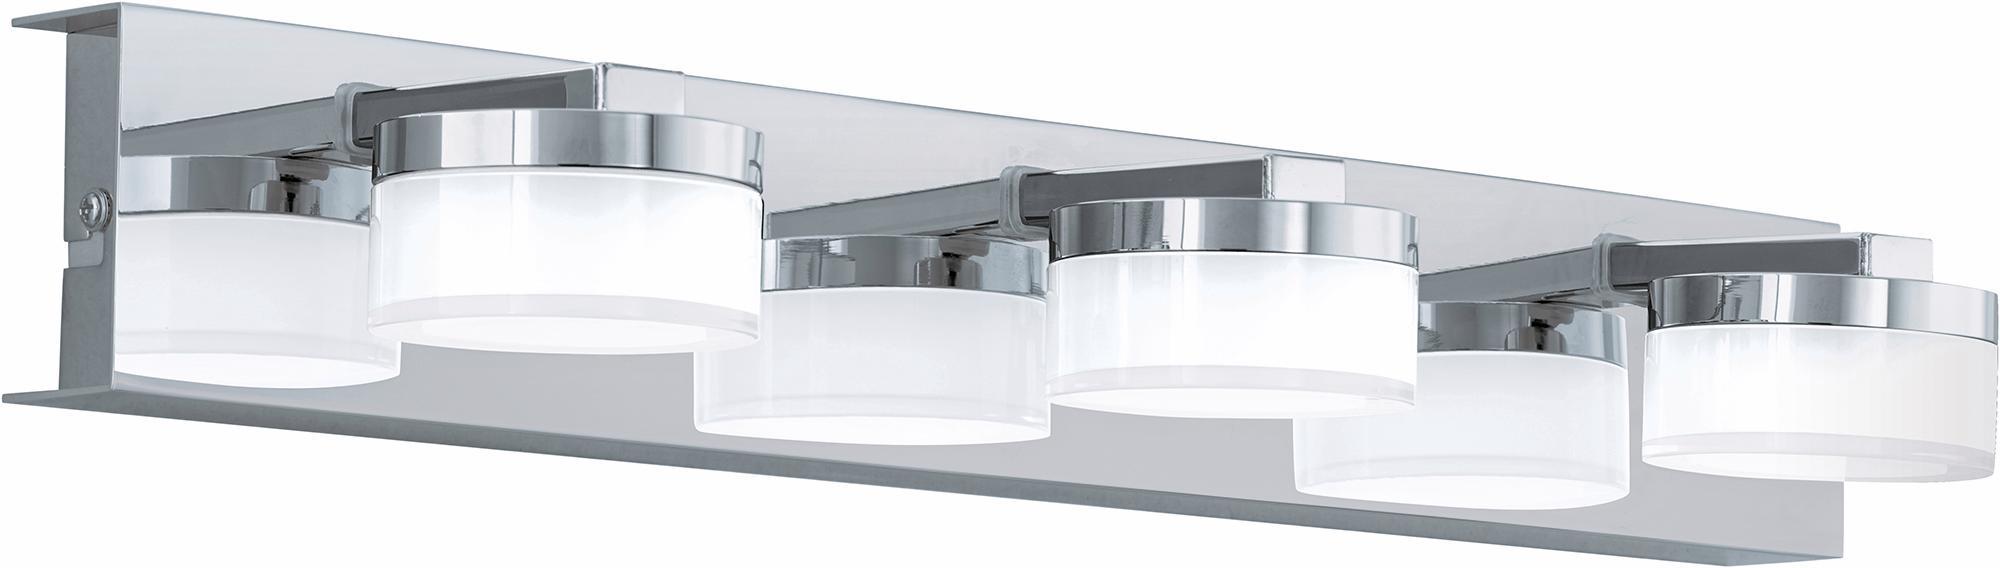 EGLO LED Wandleuchte ROMENDO   Lampen > Wandlampen   Stahl   Eglo